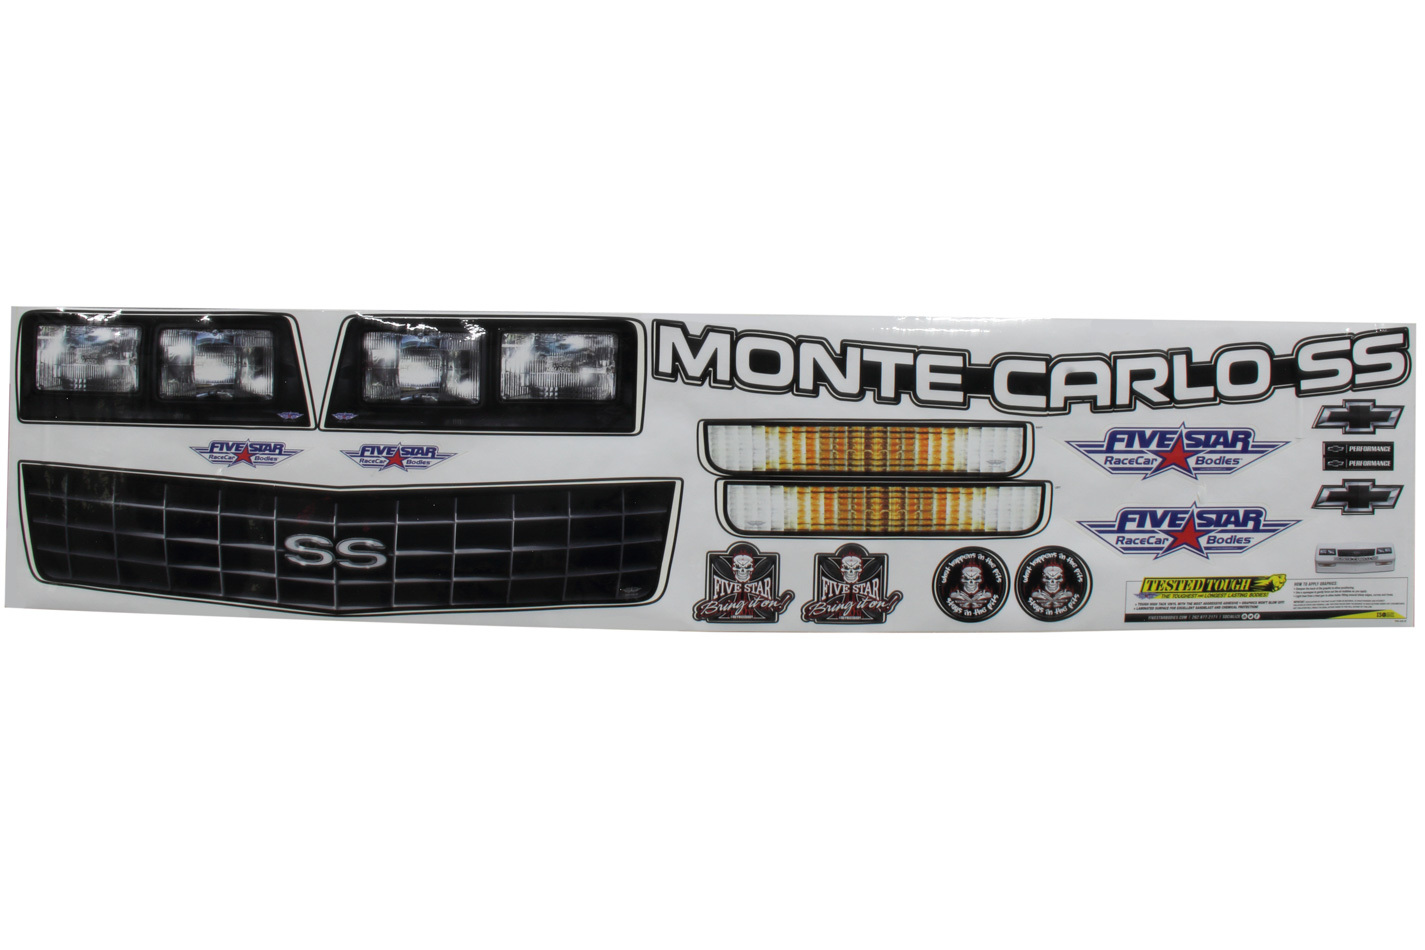 Fivestar Graphics Kit 88 Chevy Monte Carlo